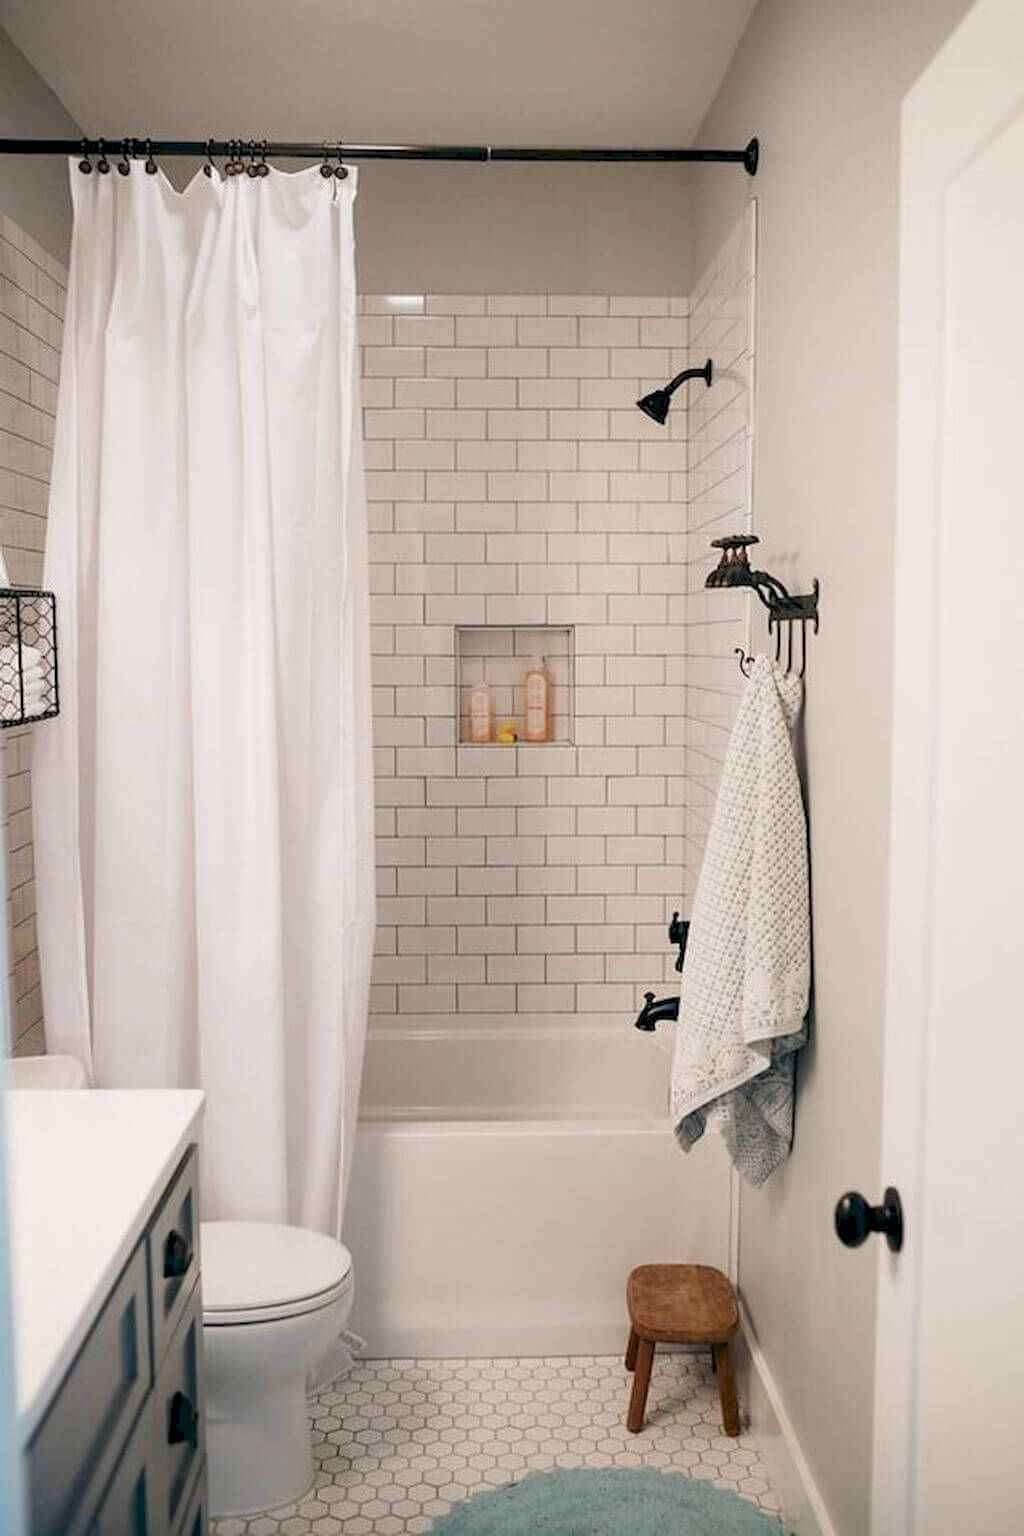 111 Brilliant Small Bathroom Remodel Ideas On A Budget (63)